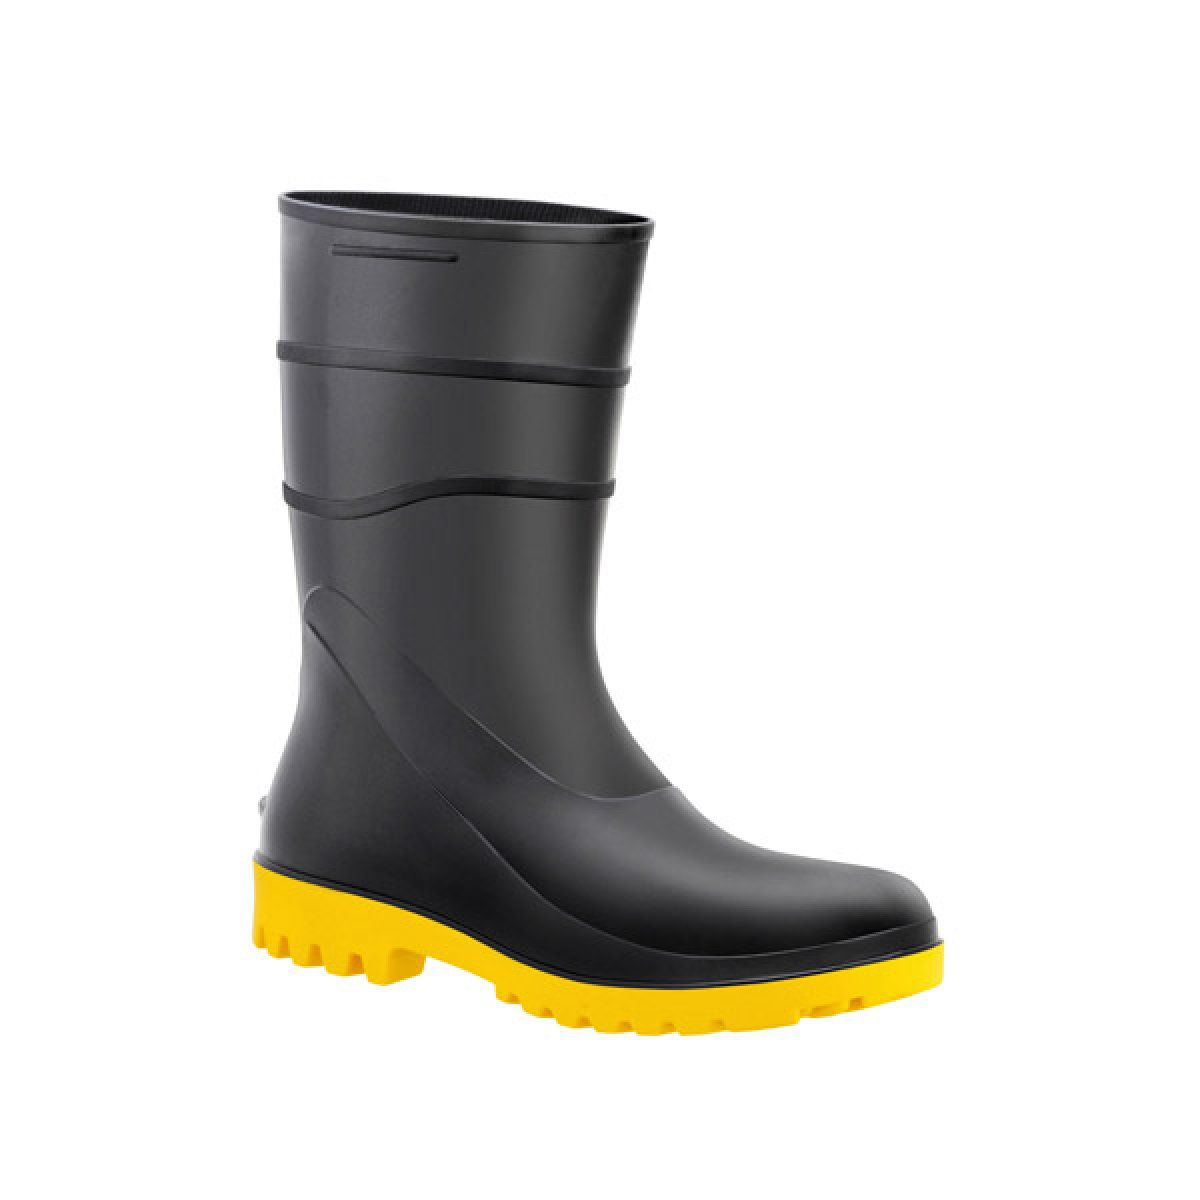 Bota de PVC Preta c/ Solado Amarelo N°40 - BRACOL